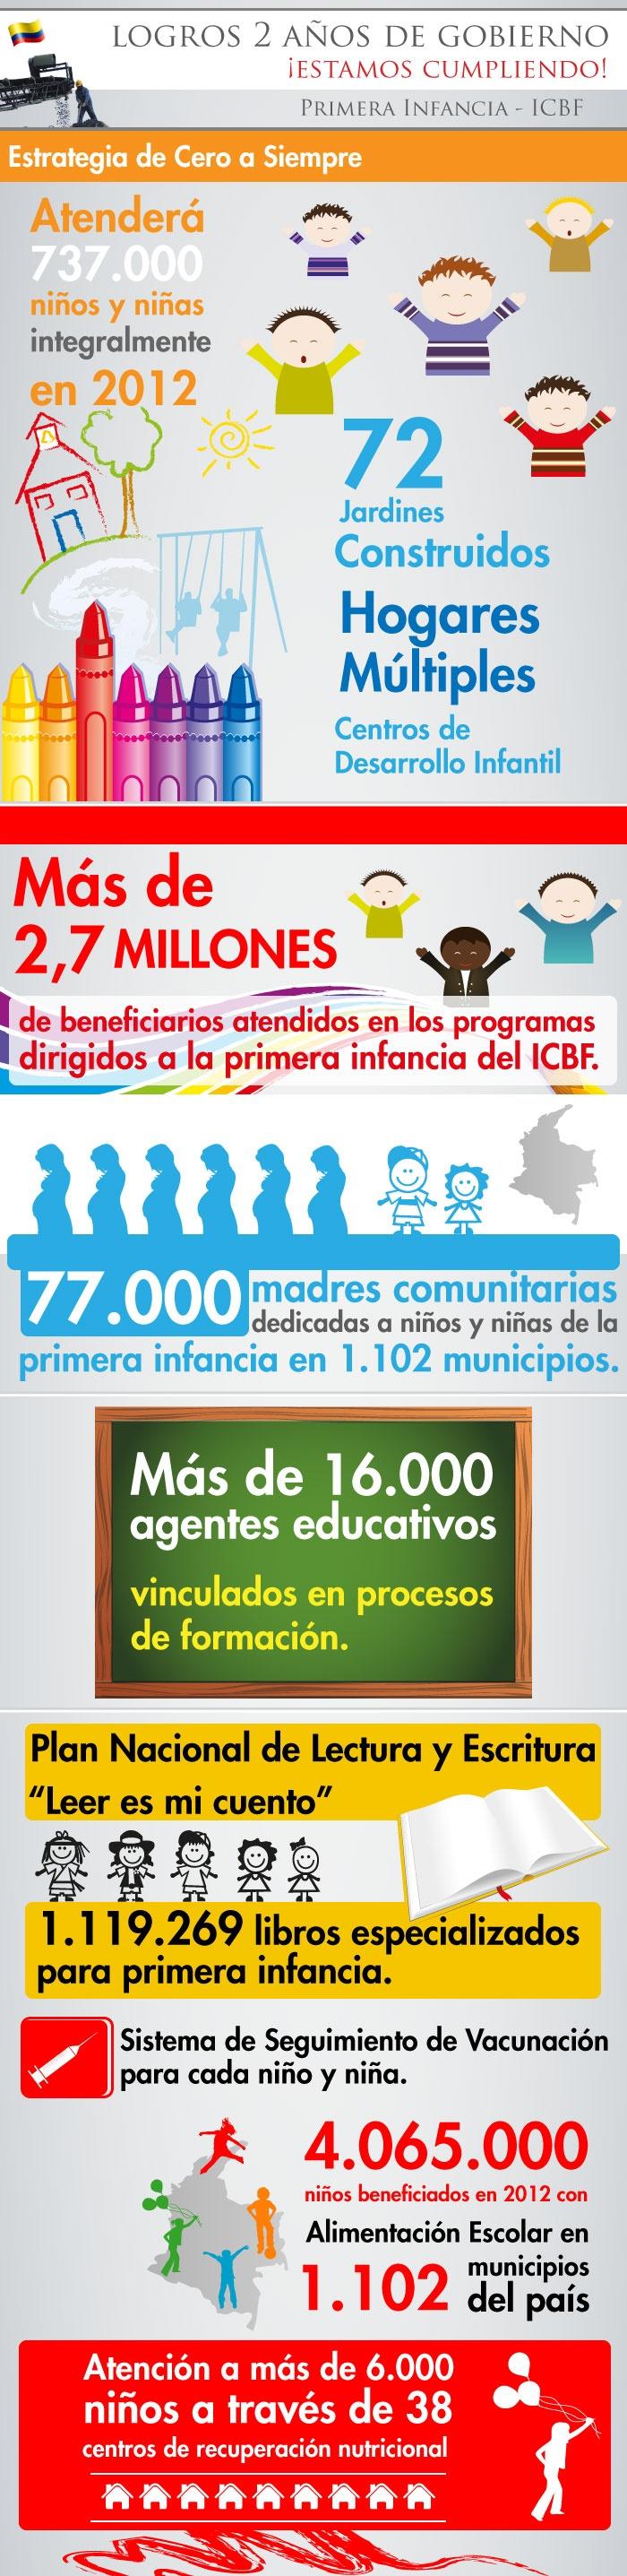 Infografía de presentación de Logros 2010/2012  ICBF, realizada por Urna de Cristal.